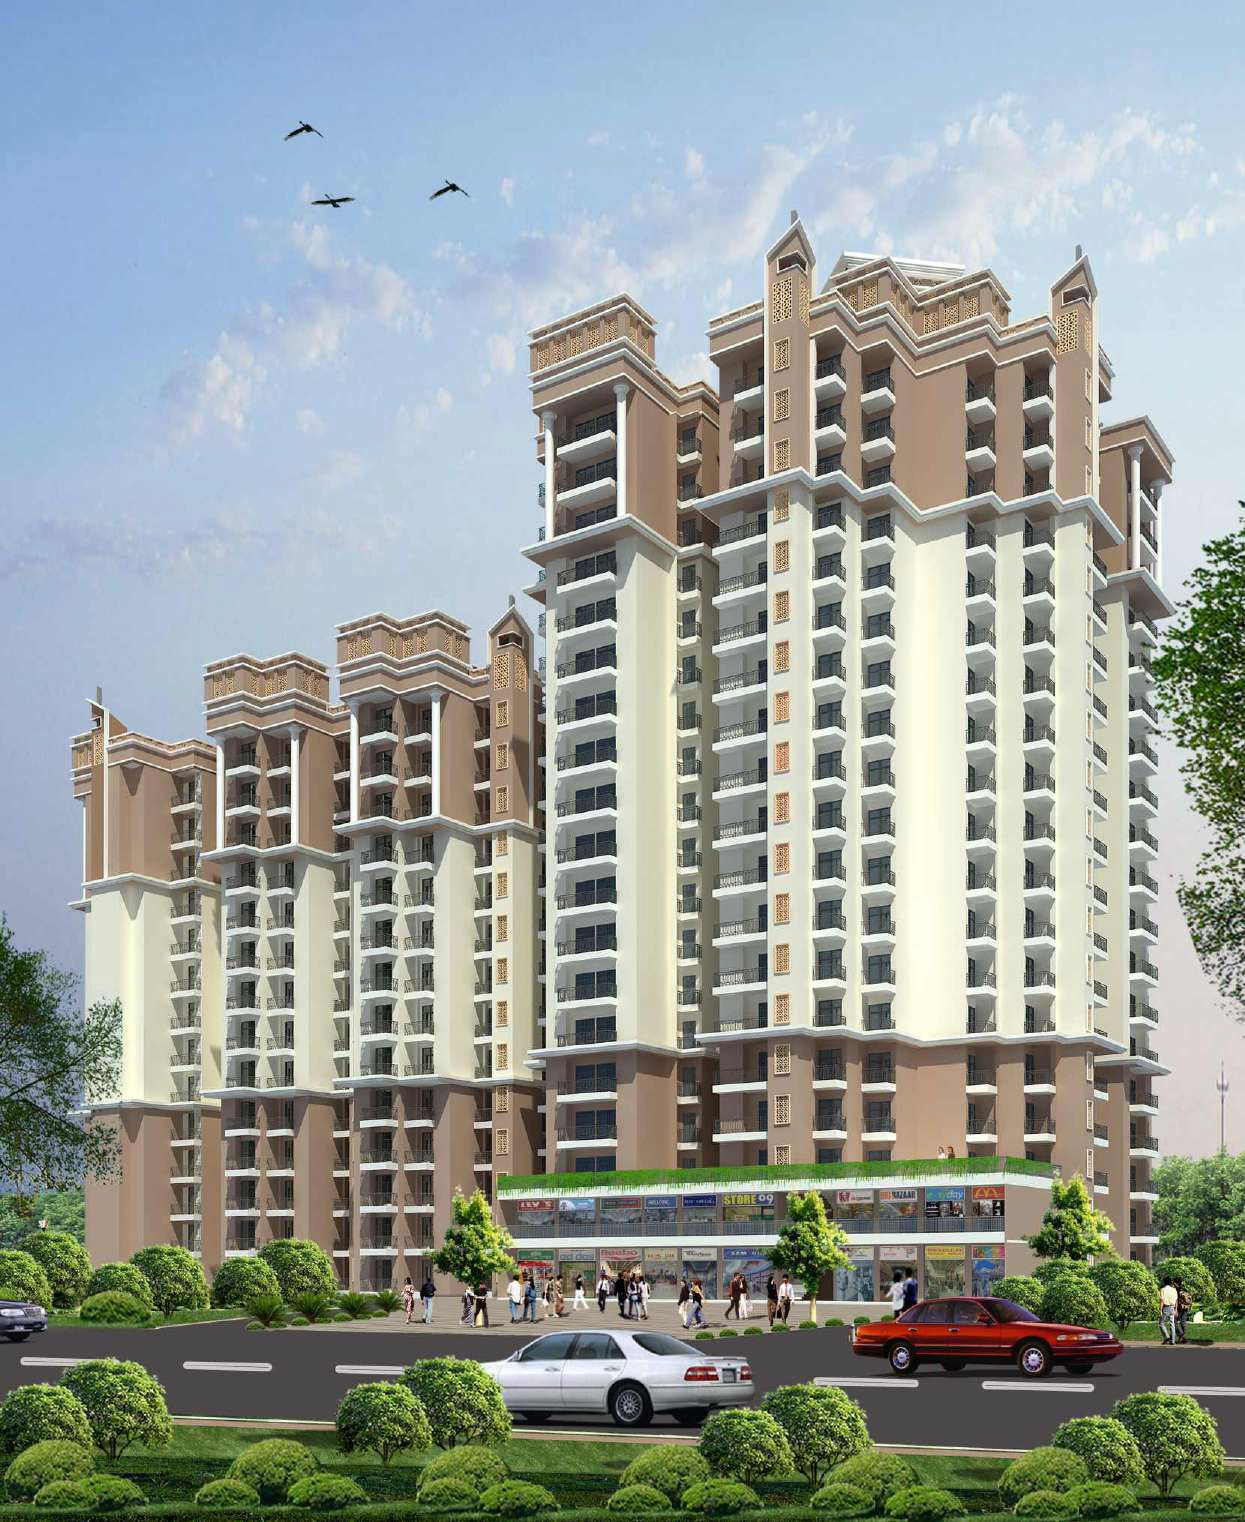 Indosam 75, Noida - 2, 3 & 4 BHK Apartments for sale